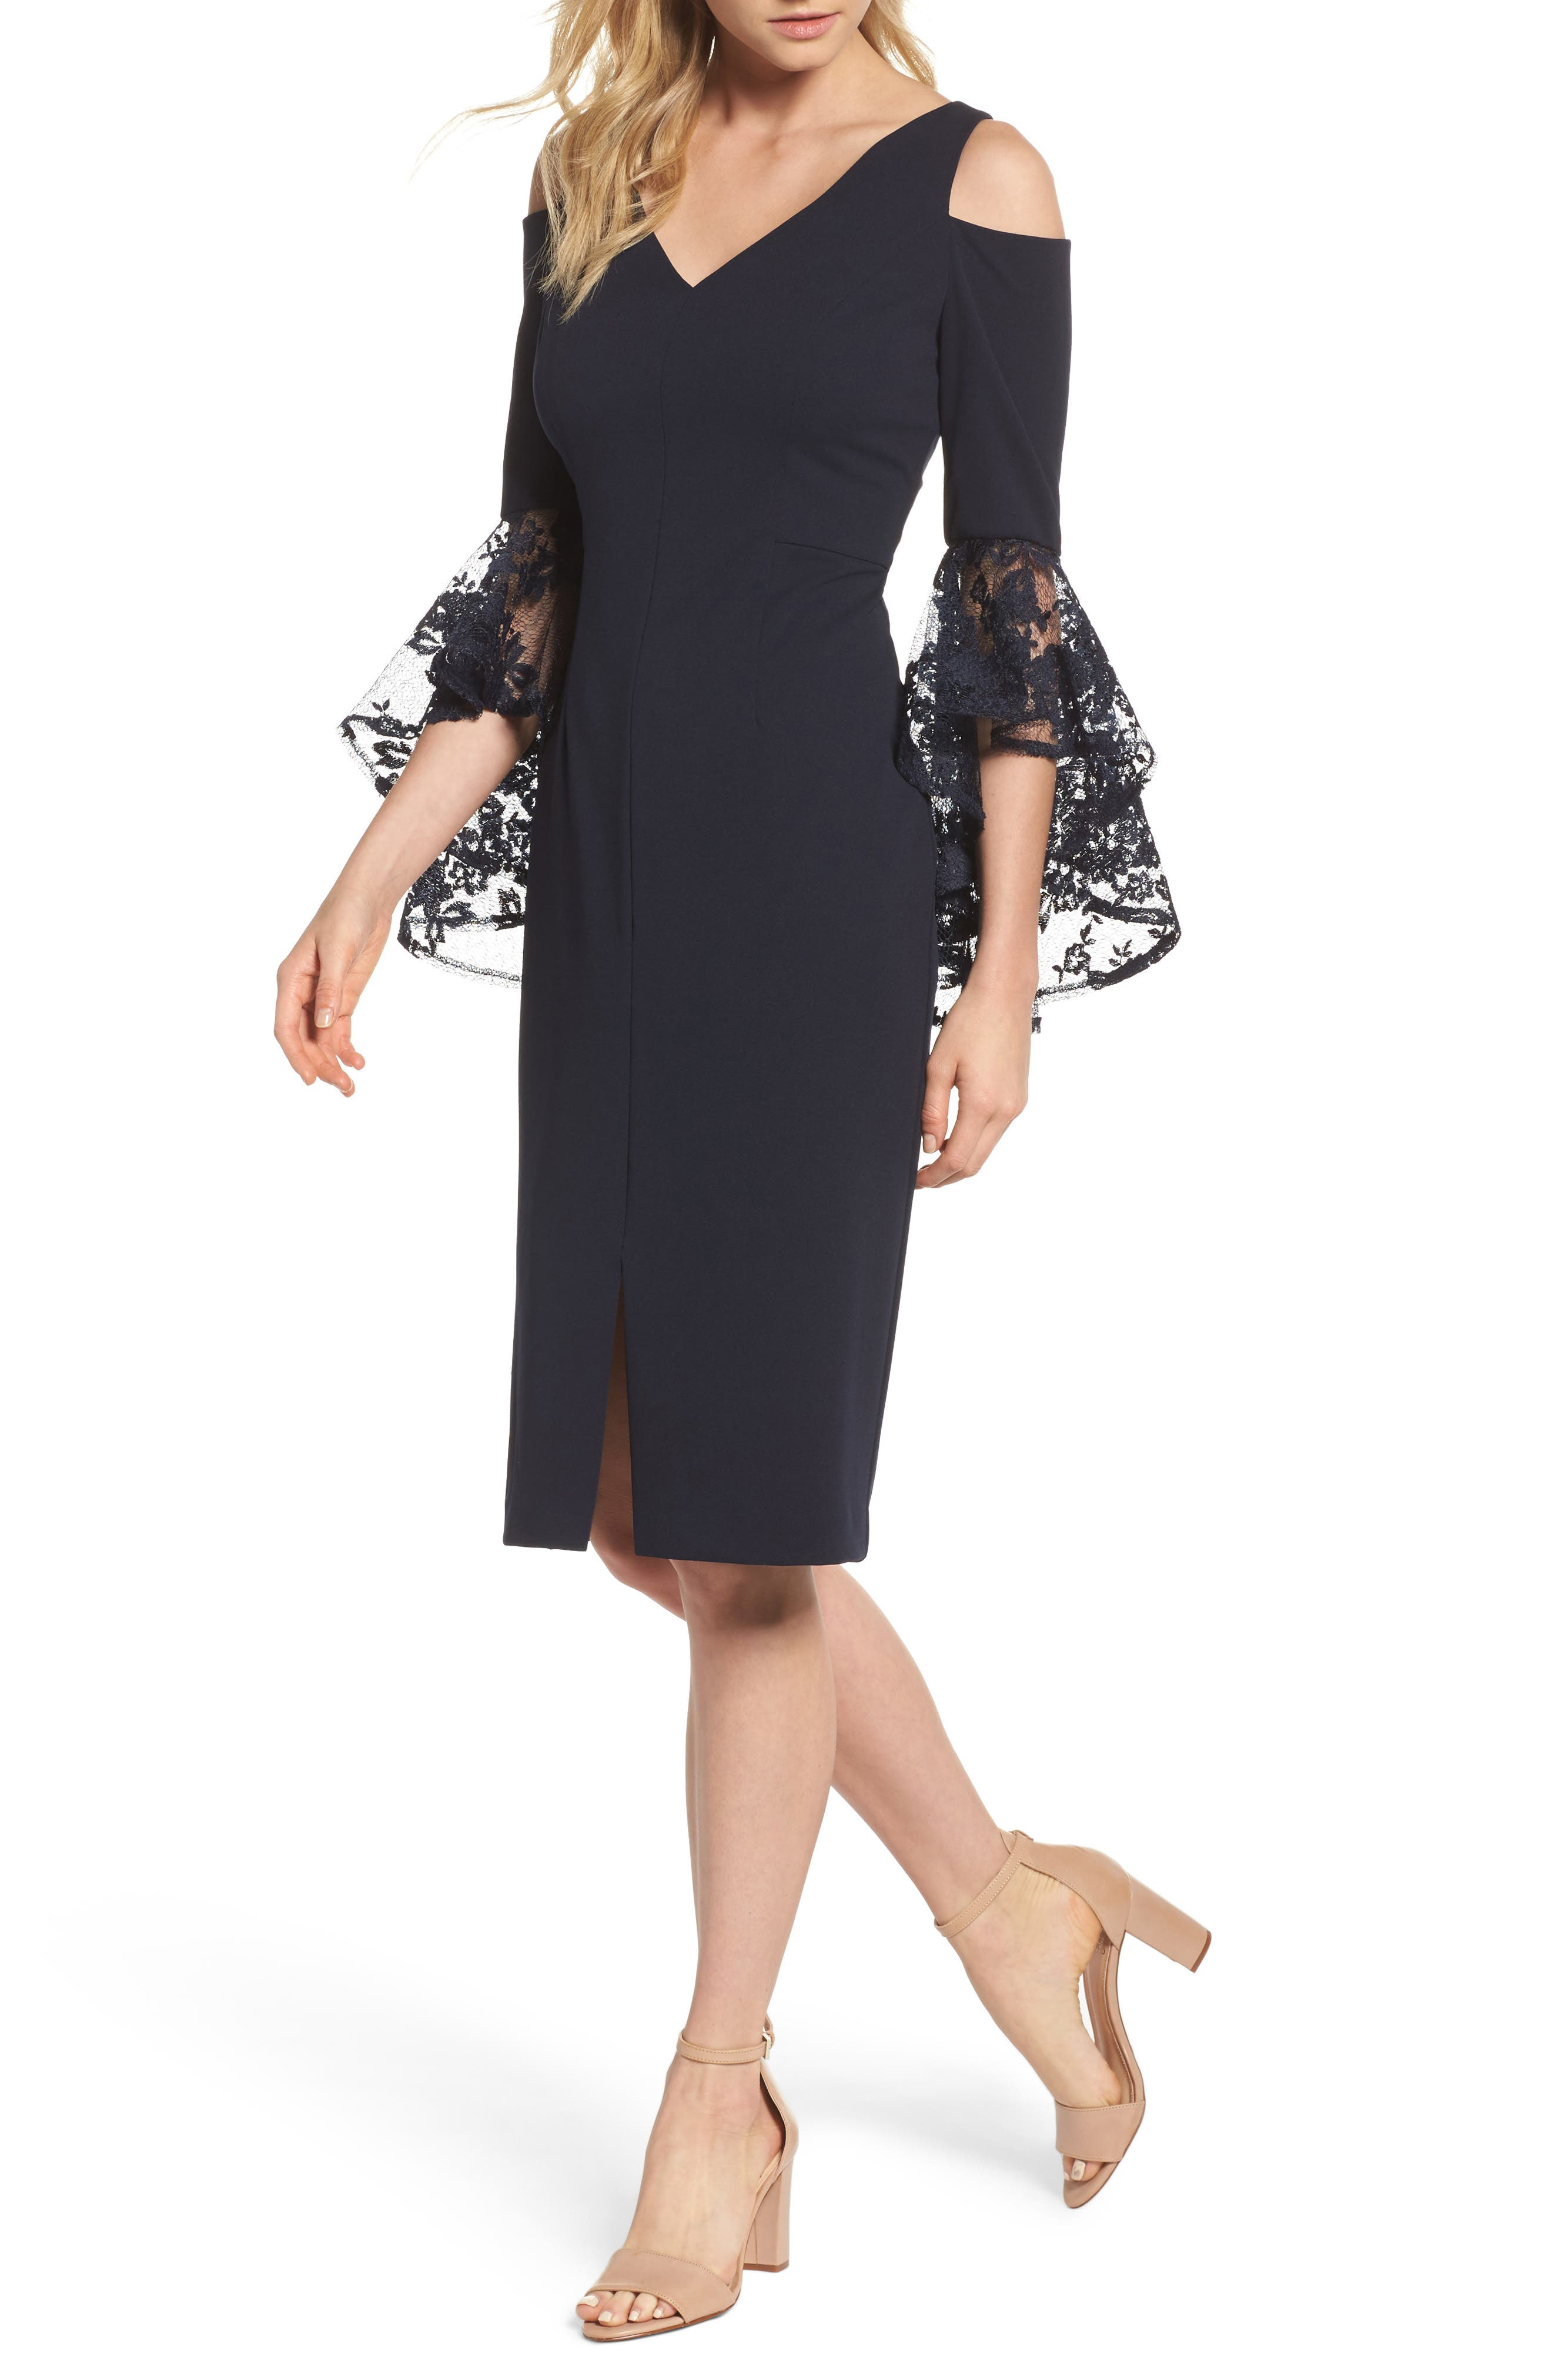 Alternate Image 1 Selected - Maggy London Cold Shoulder Sheath Dress